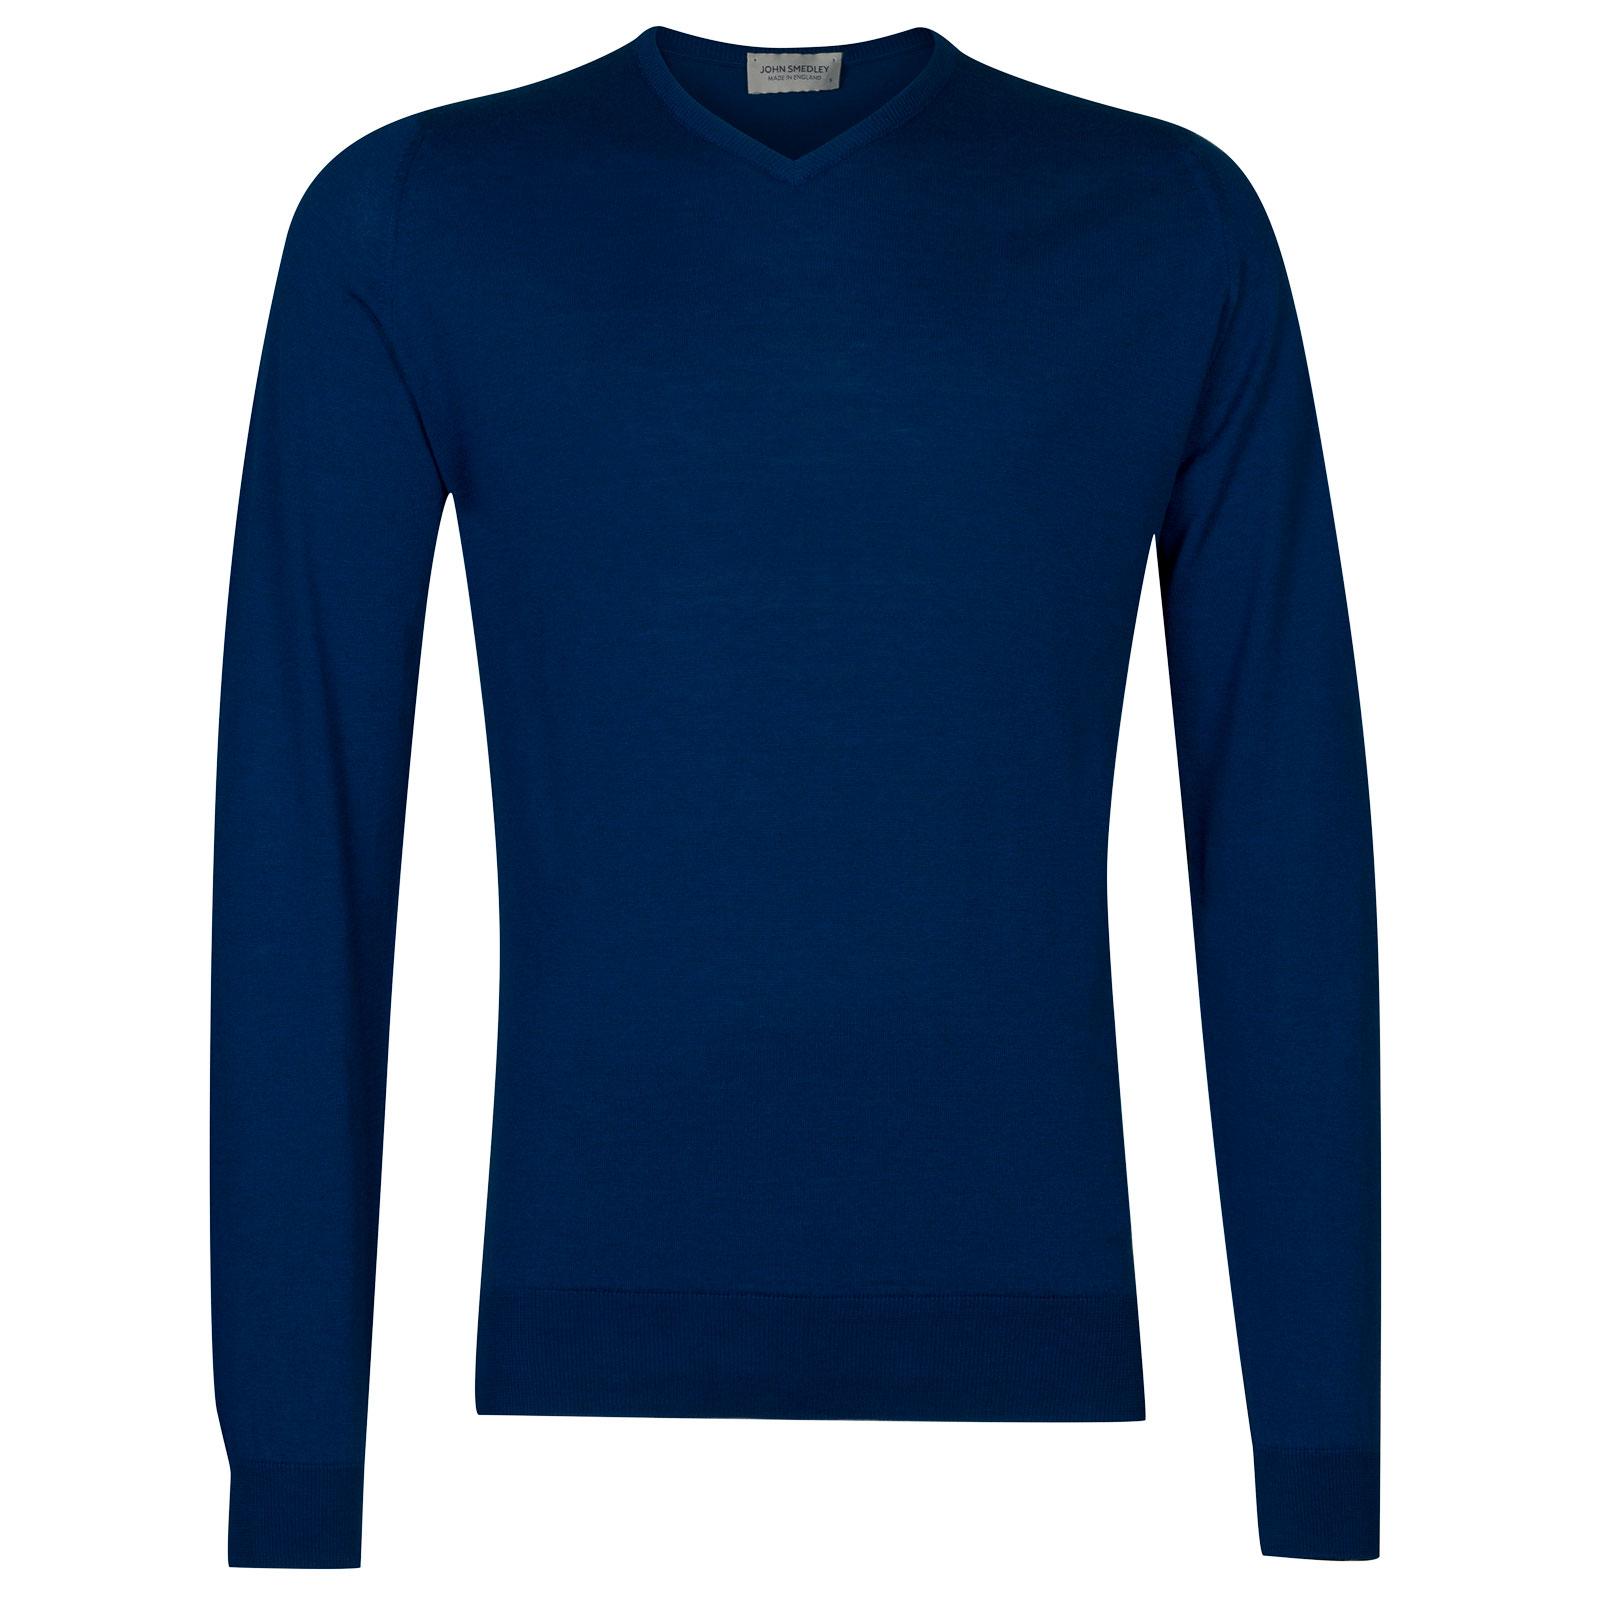 aydon-stevens-blue-Xxl